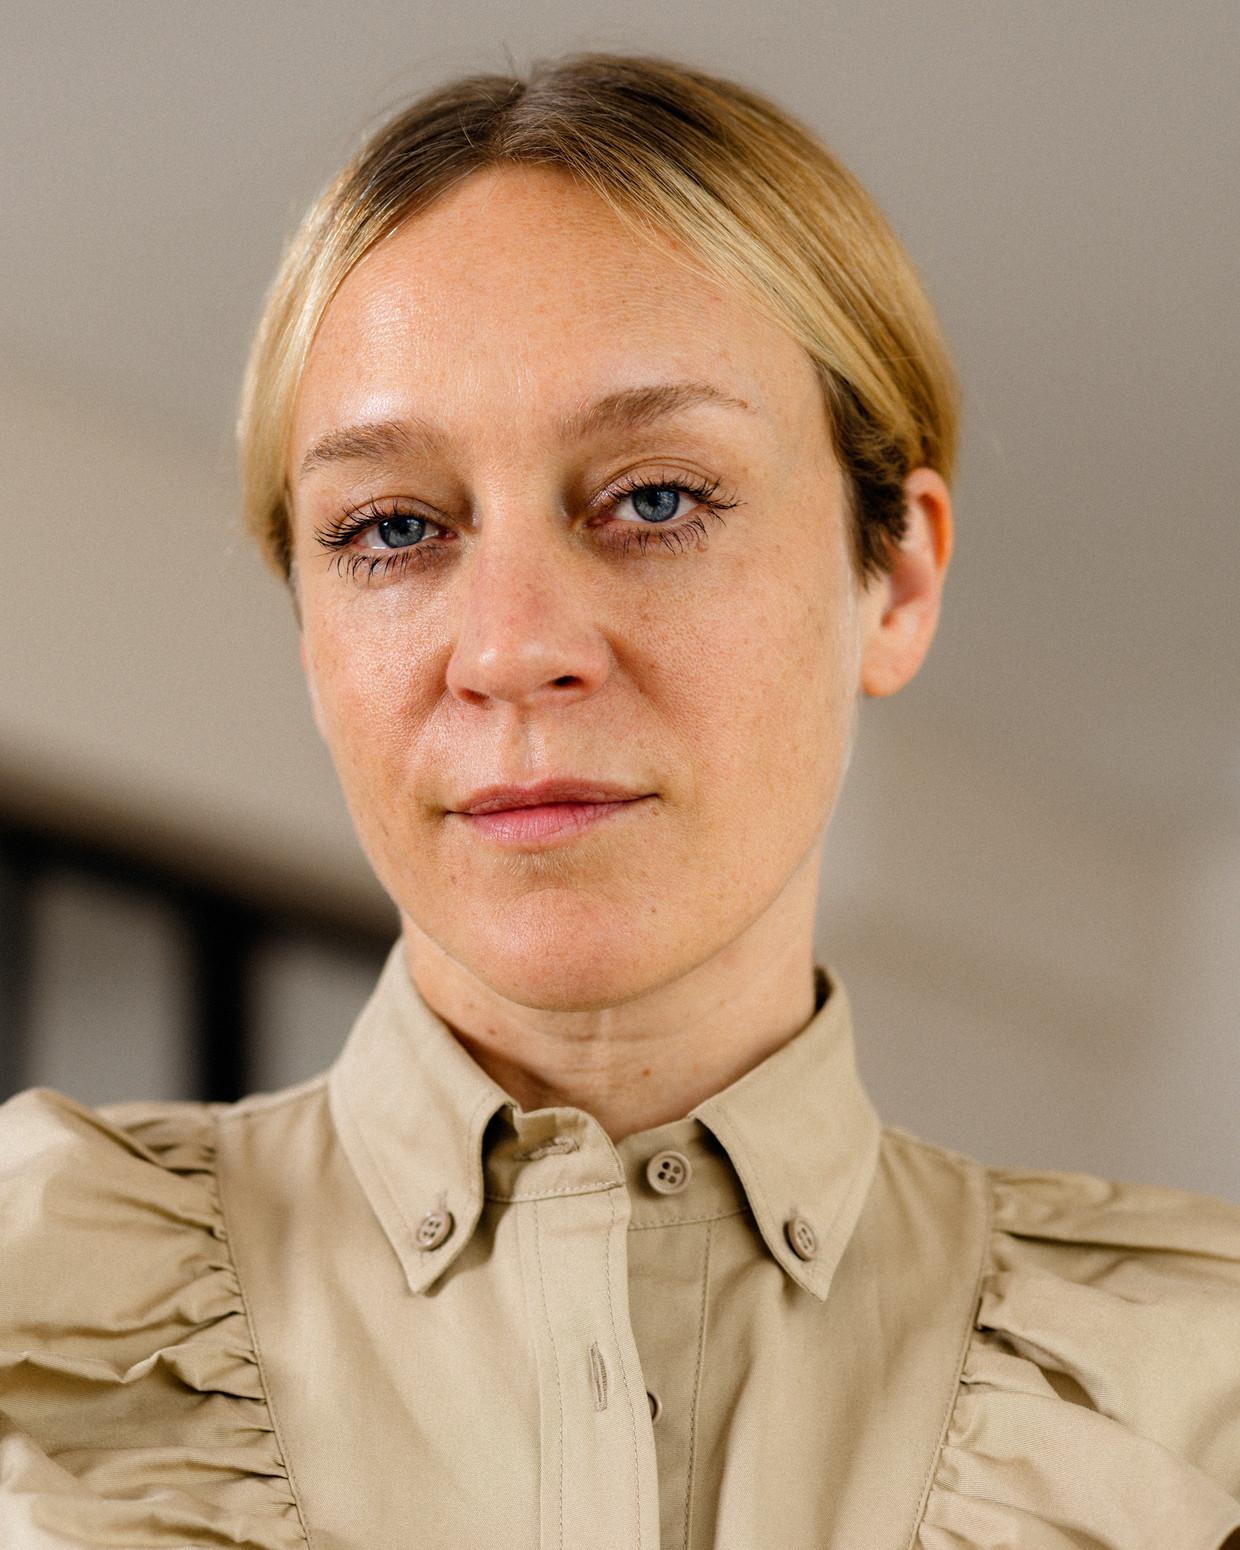 Chloë Sevigny Beeld Molly Matalon / The New York Times